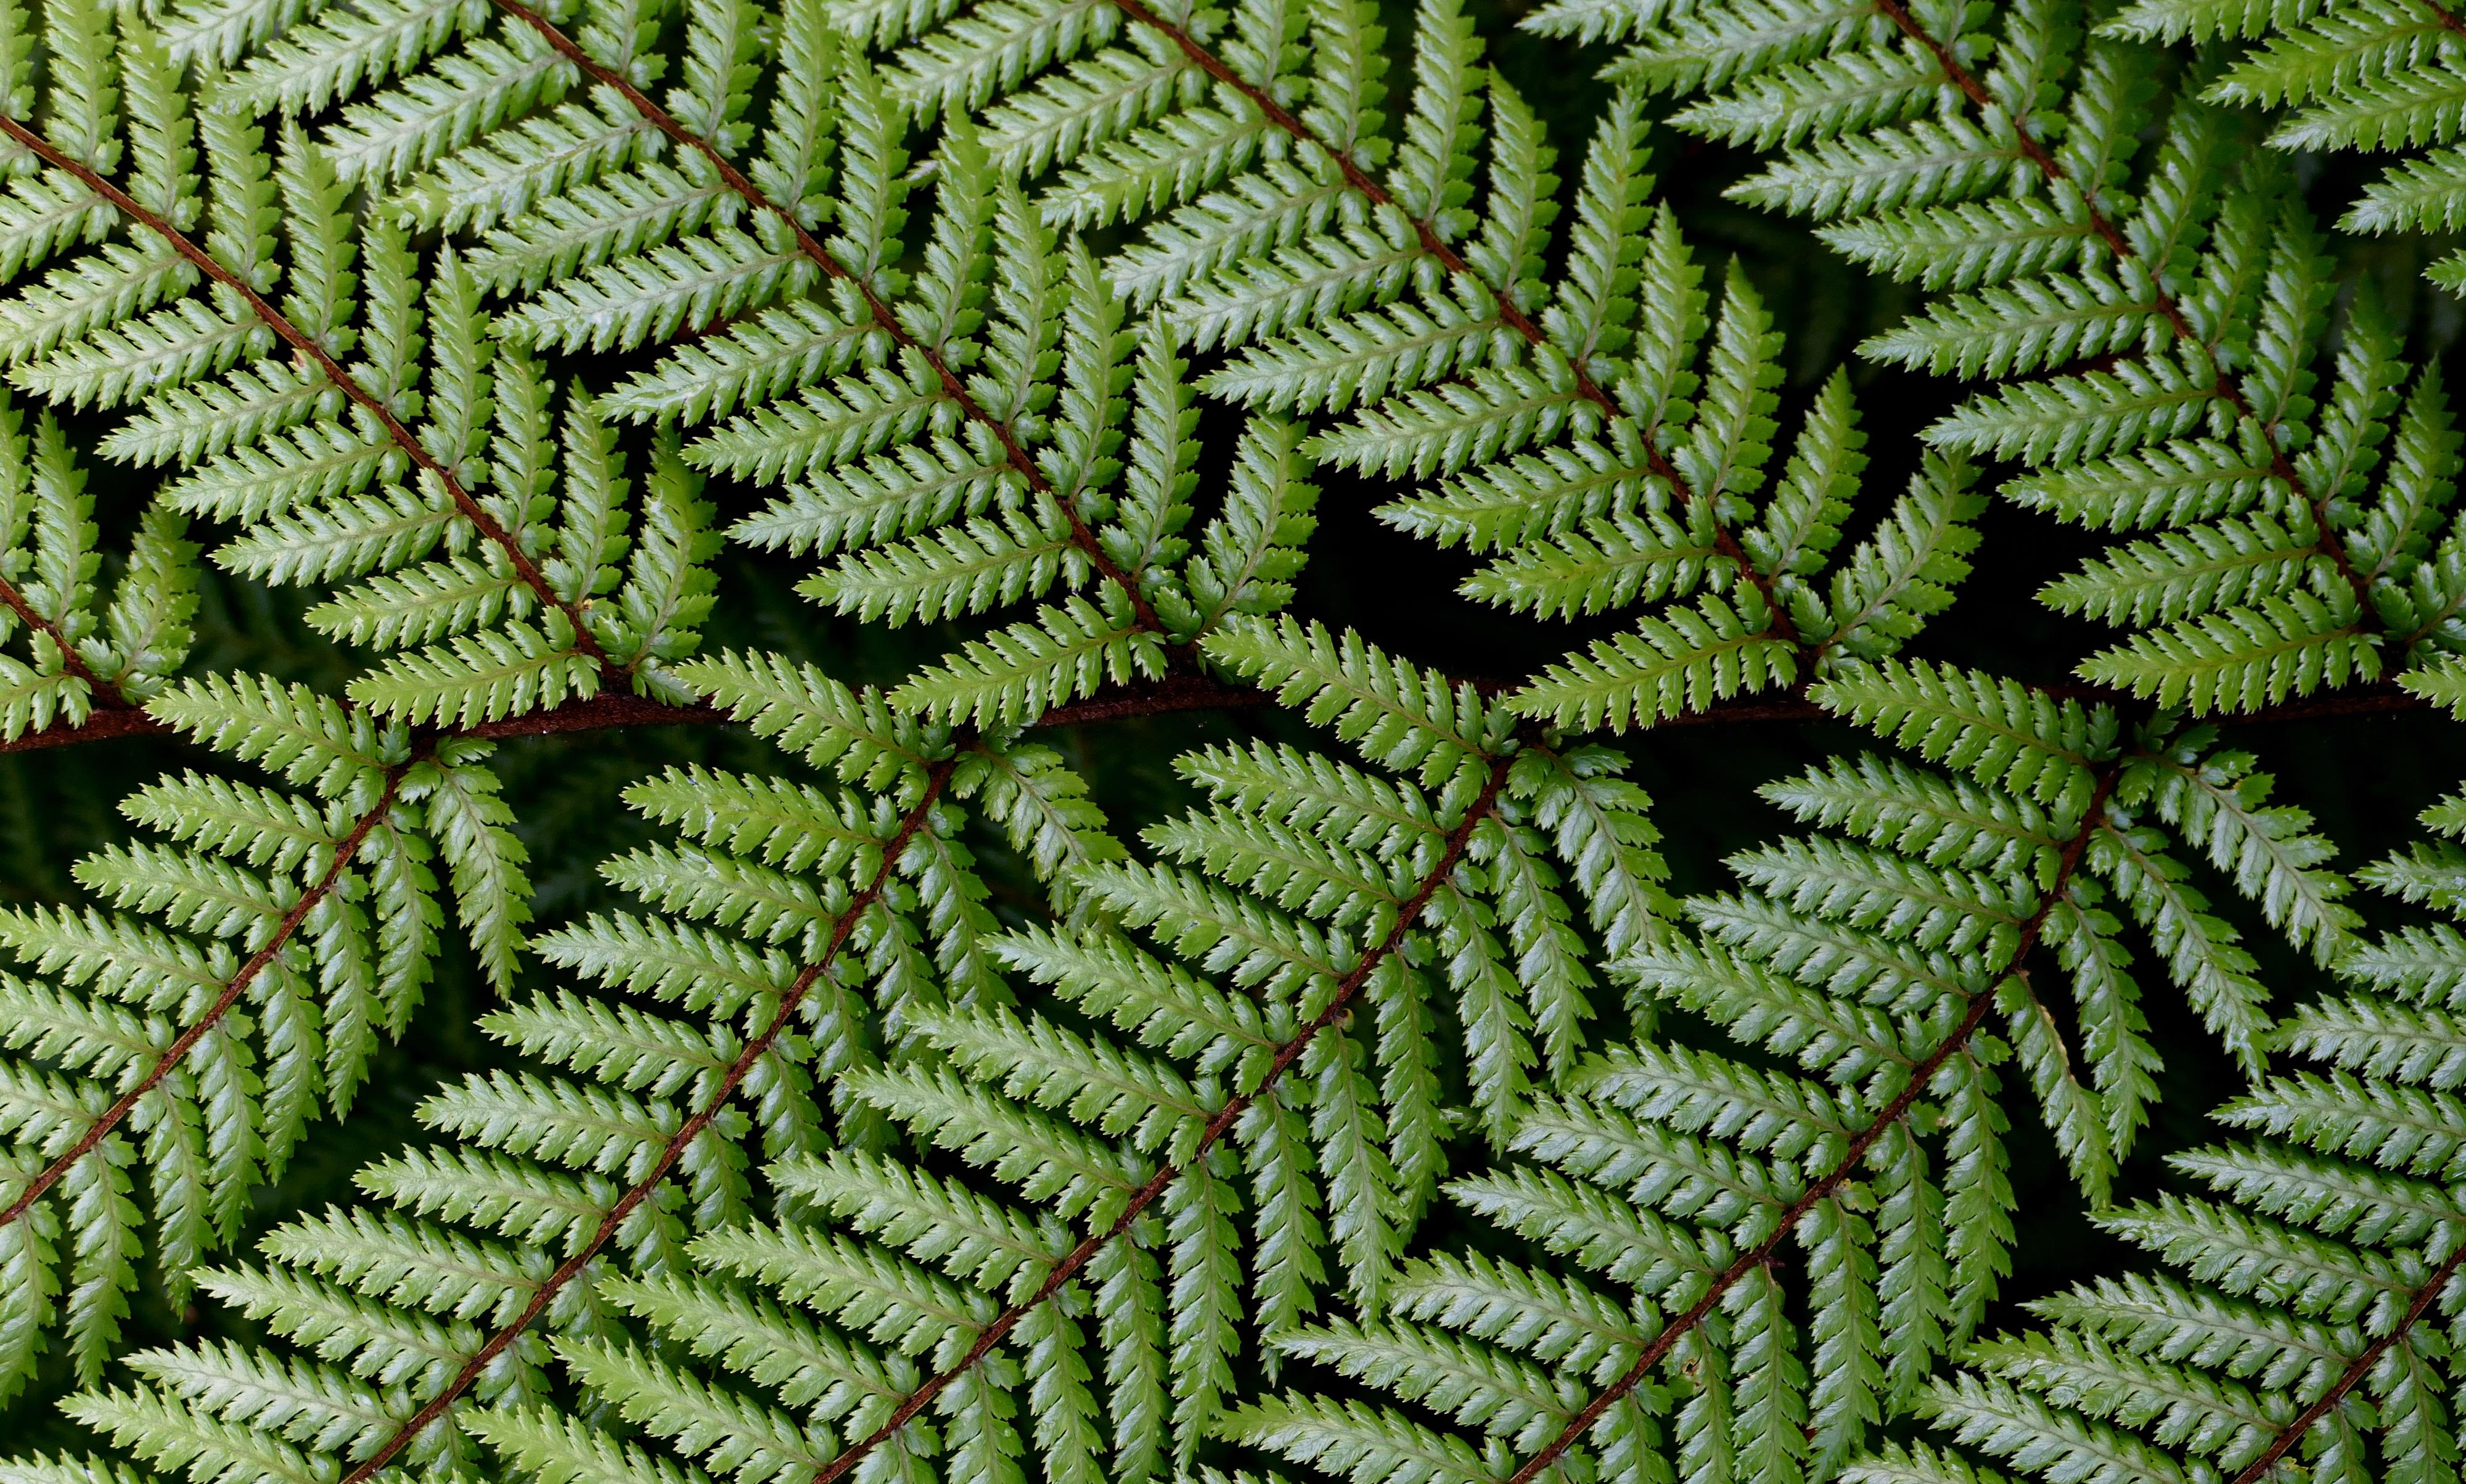 Dicksonia squarrosa wheki. nz fern. photo